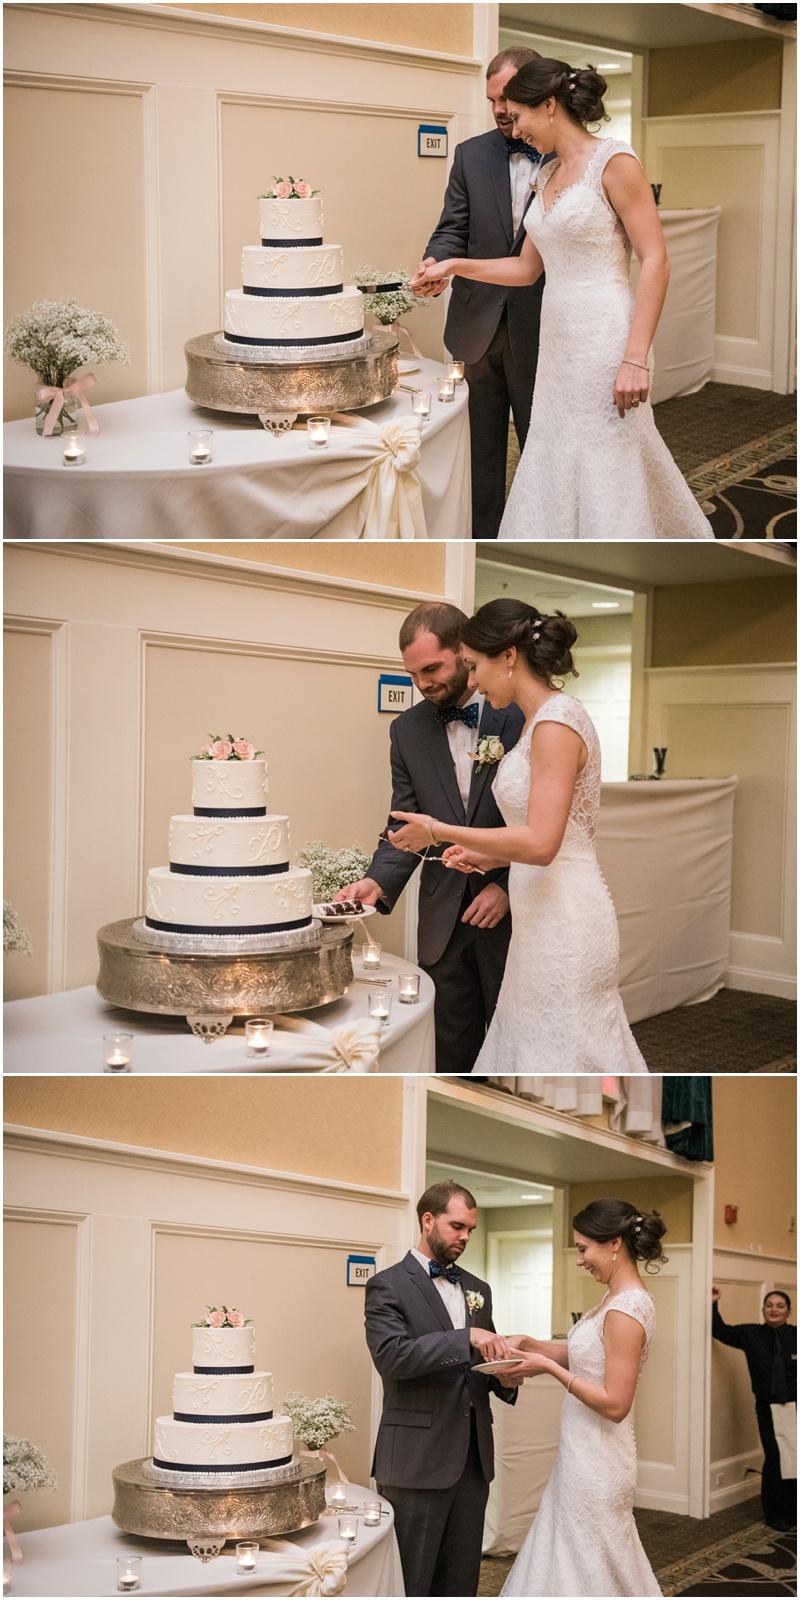 Mccoy-Emmett Wedding-408.JPG